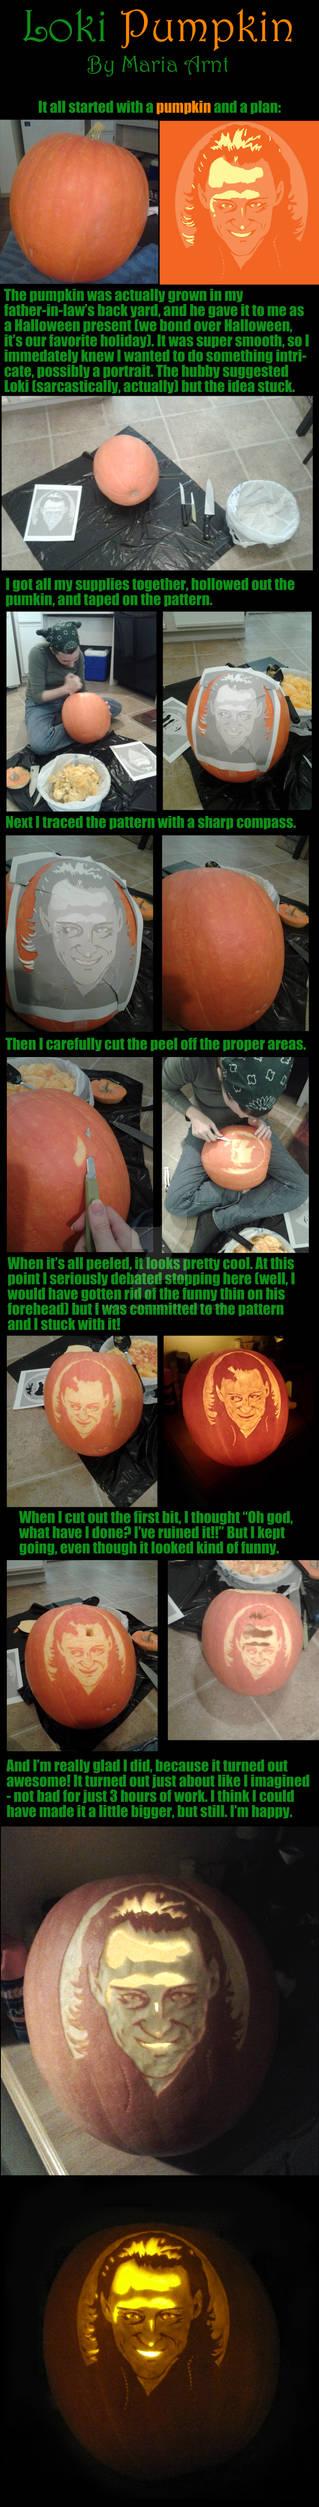 Carving the Lokilantern